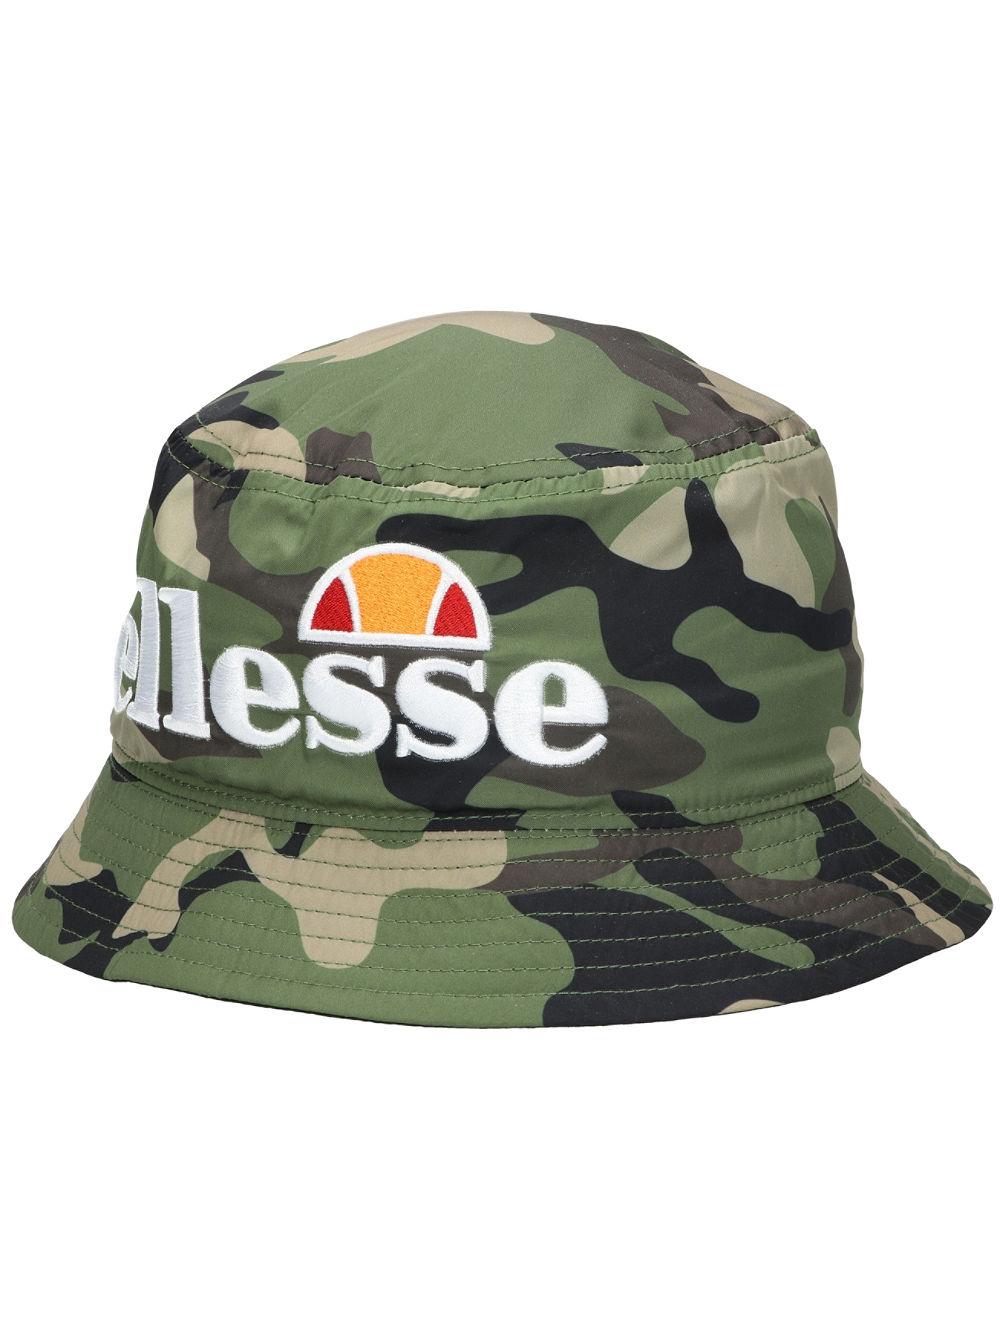 9c65588f82e Buy Ellesse Rassel Bucket Hat online at Blue Tomato